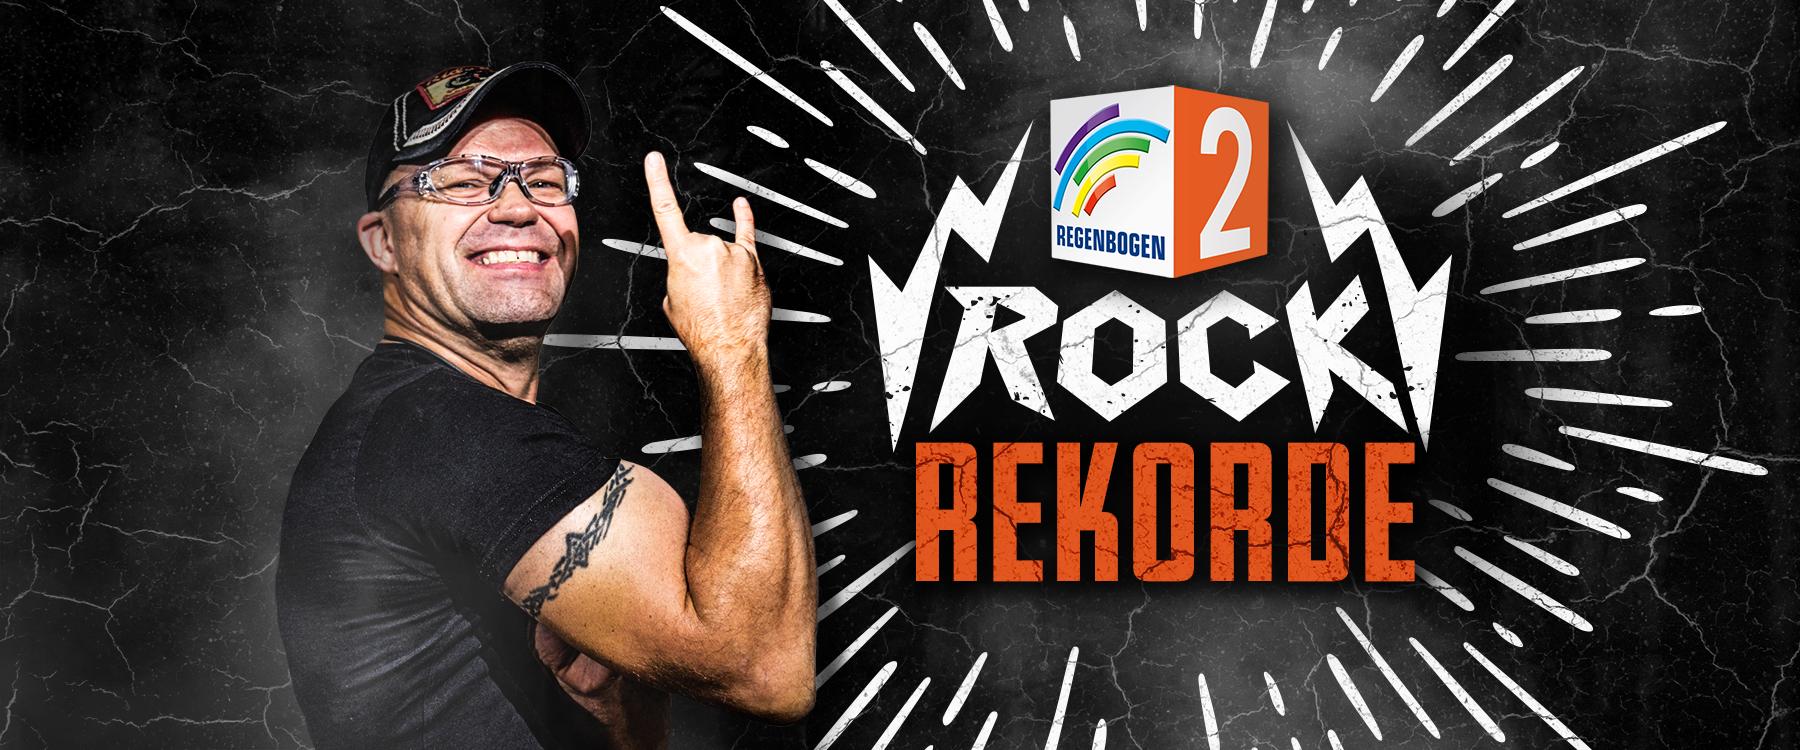 R2-Rock-Rekorde-Titel.png